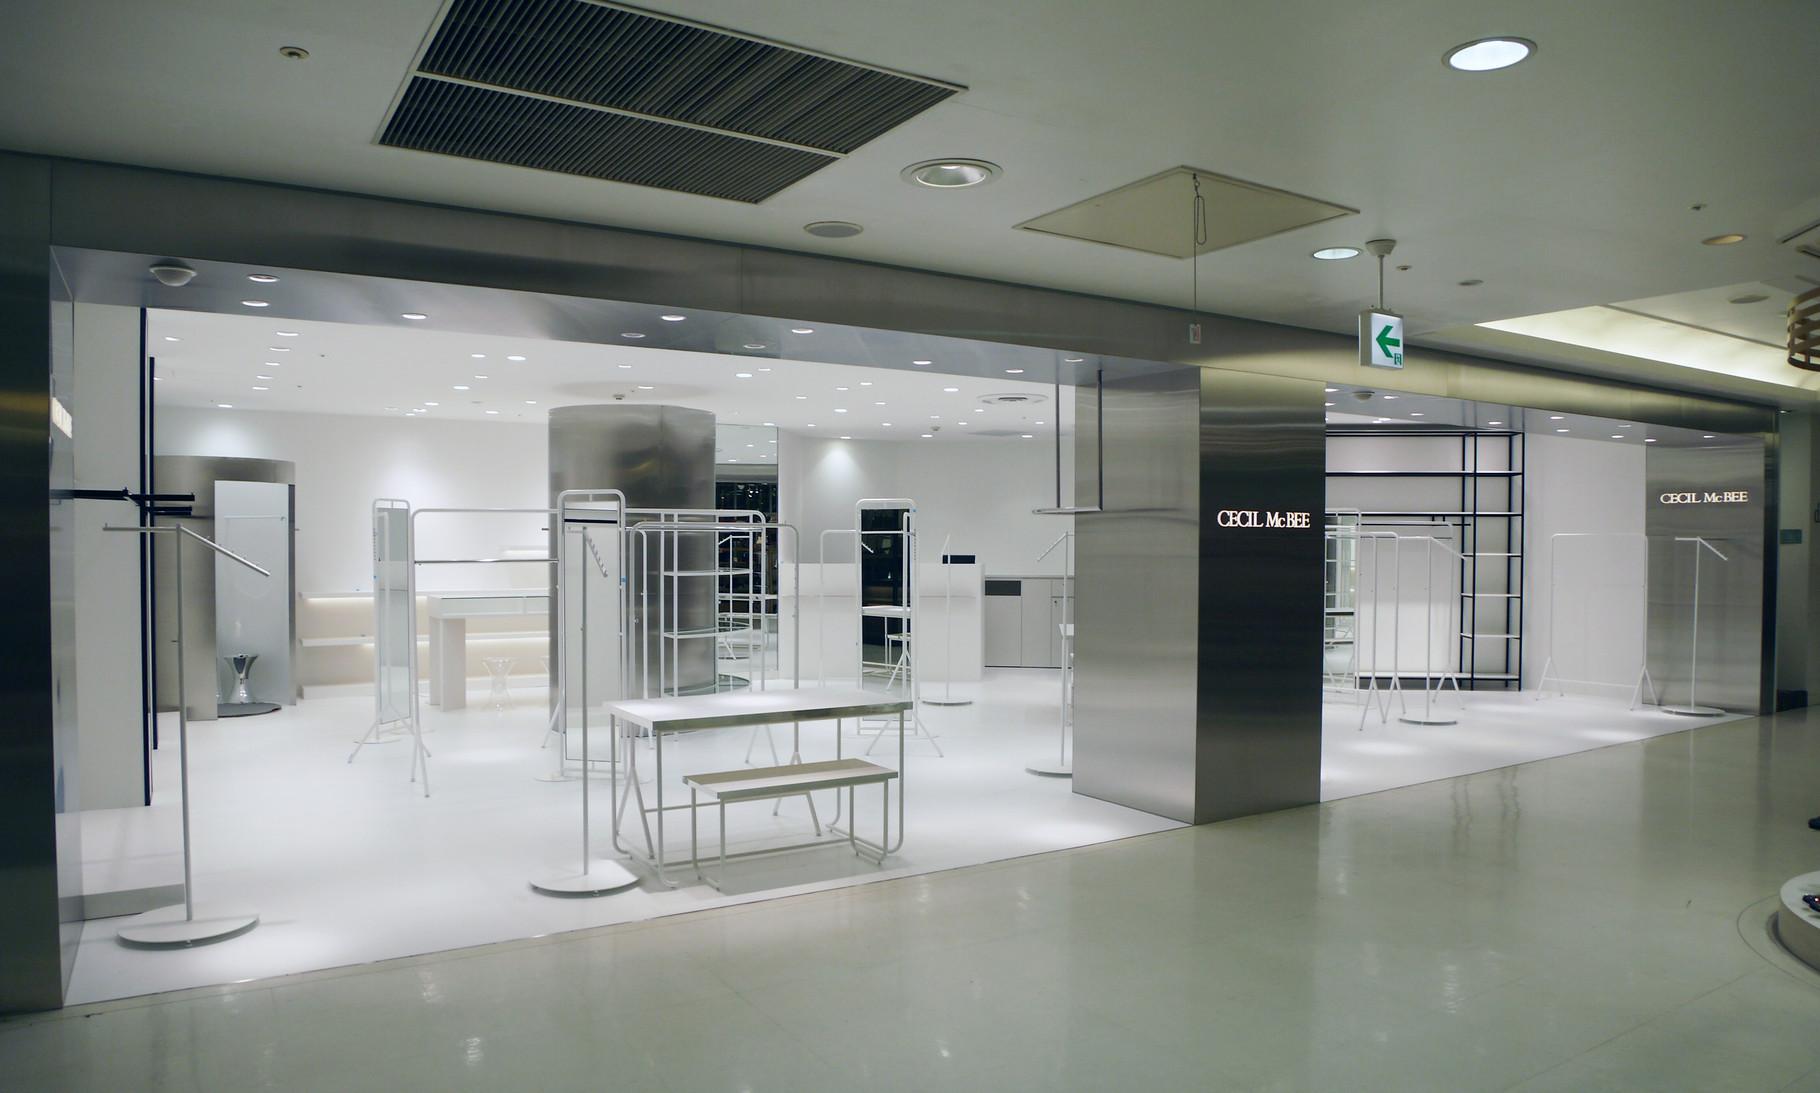 CECILMcBEE 広島パルコ店様【新装/施工】